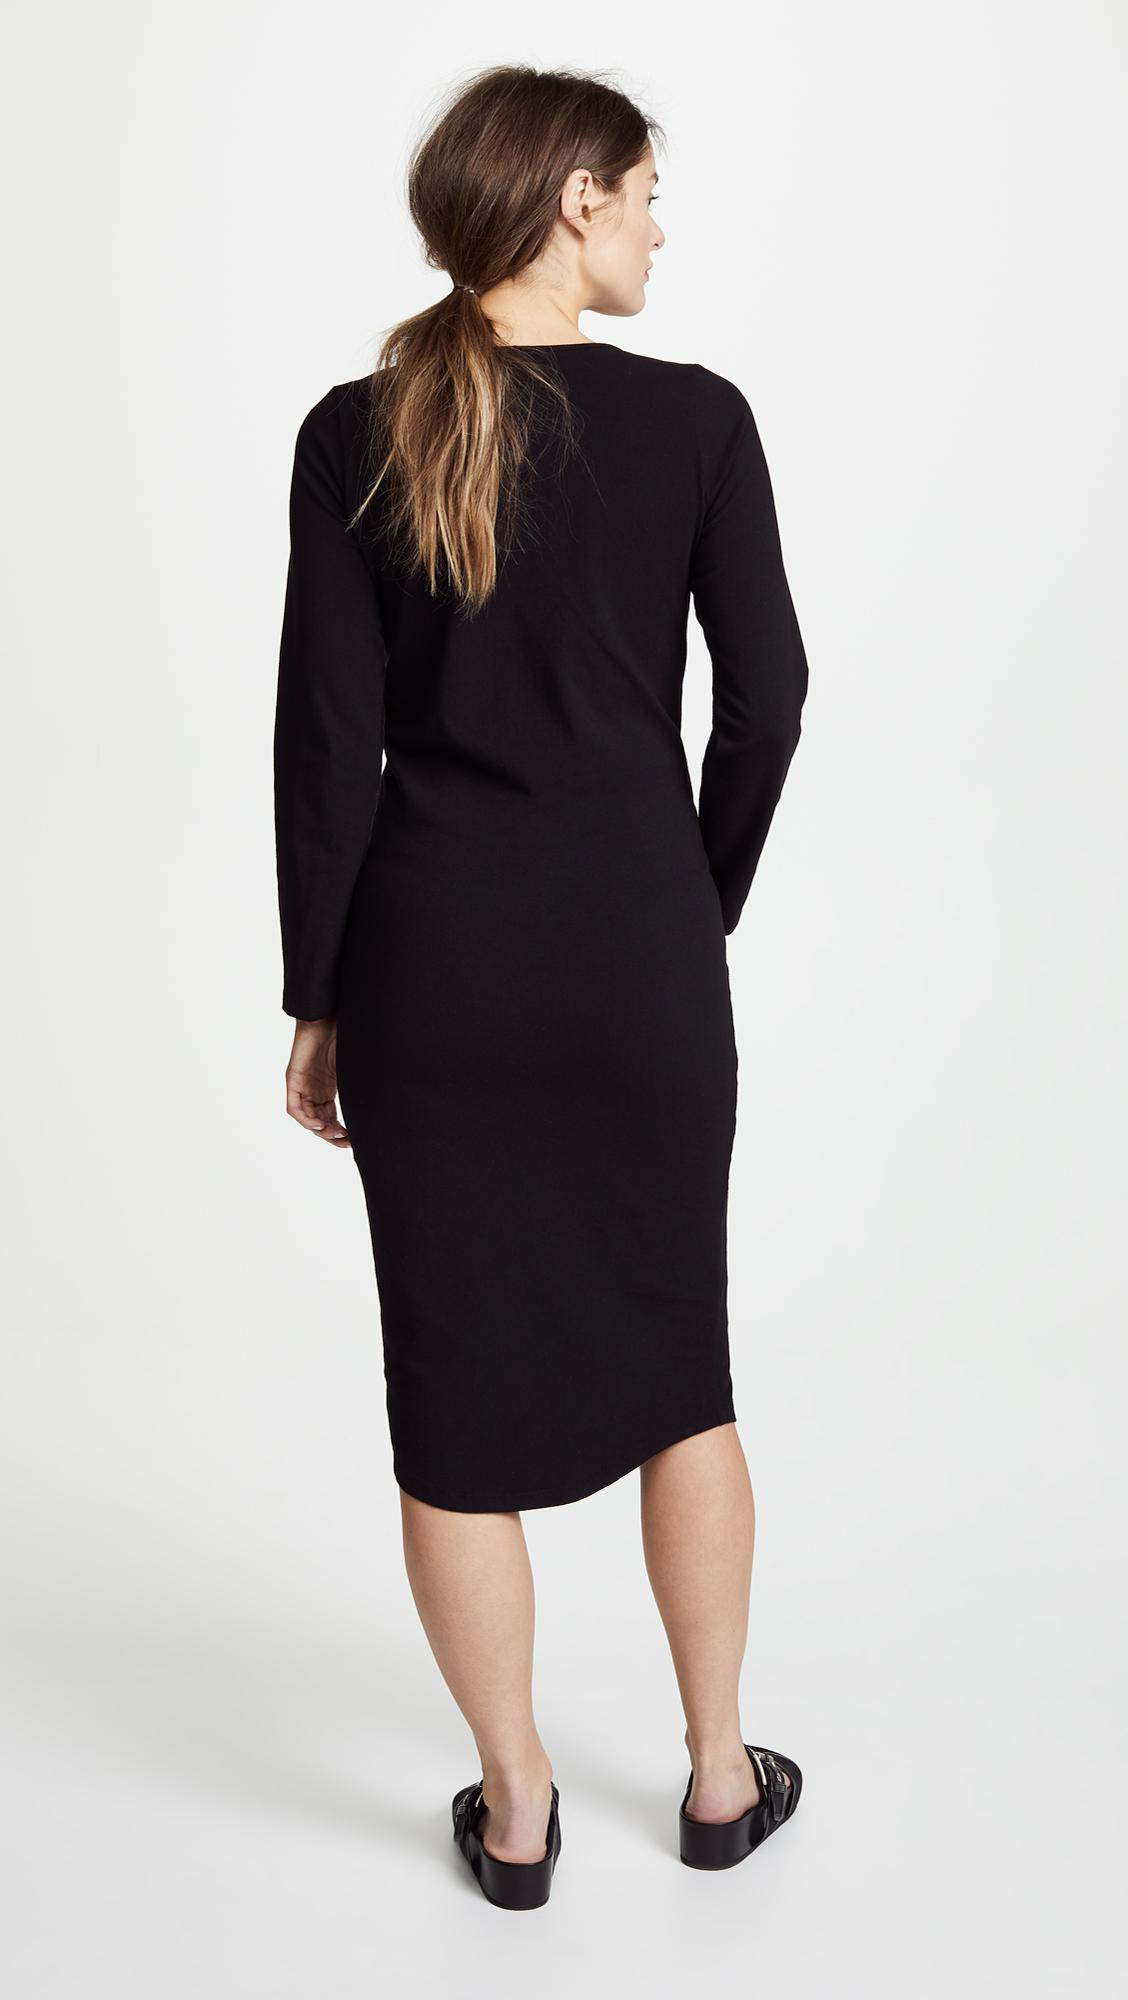 c68560b18ef Monrow Maternity Long Sleeve Dress in Black - Save 6.603773584905667 ...